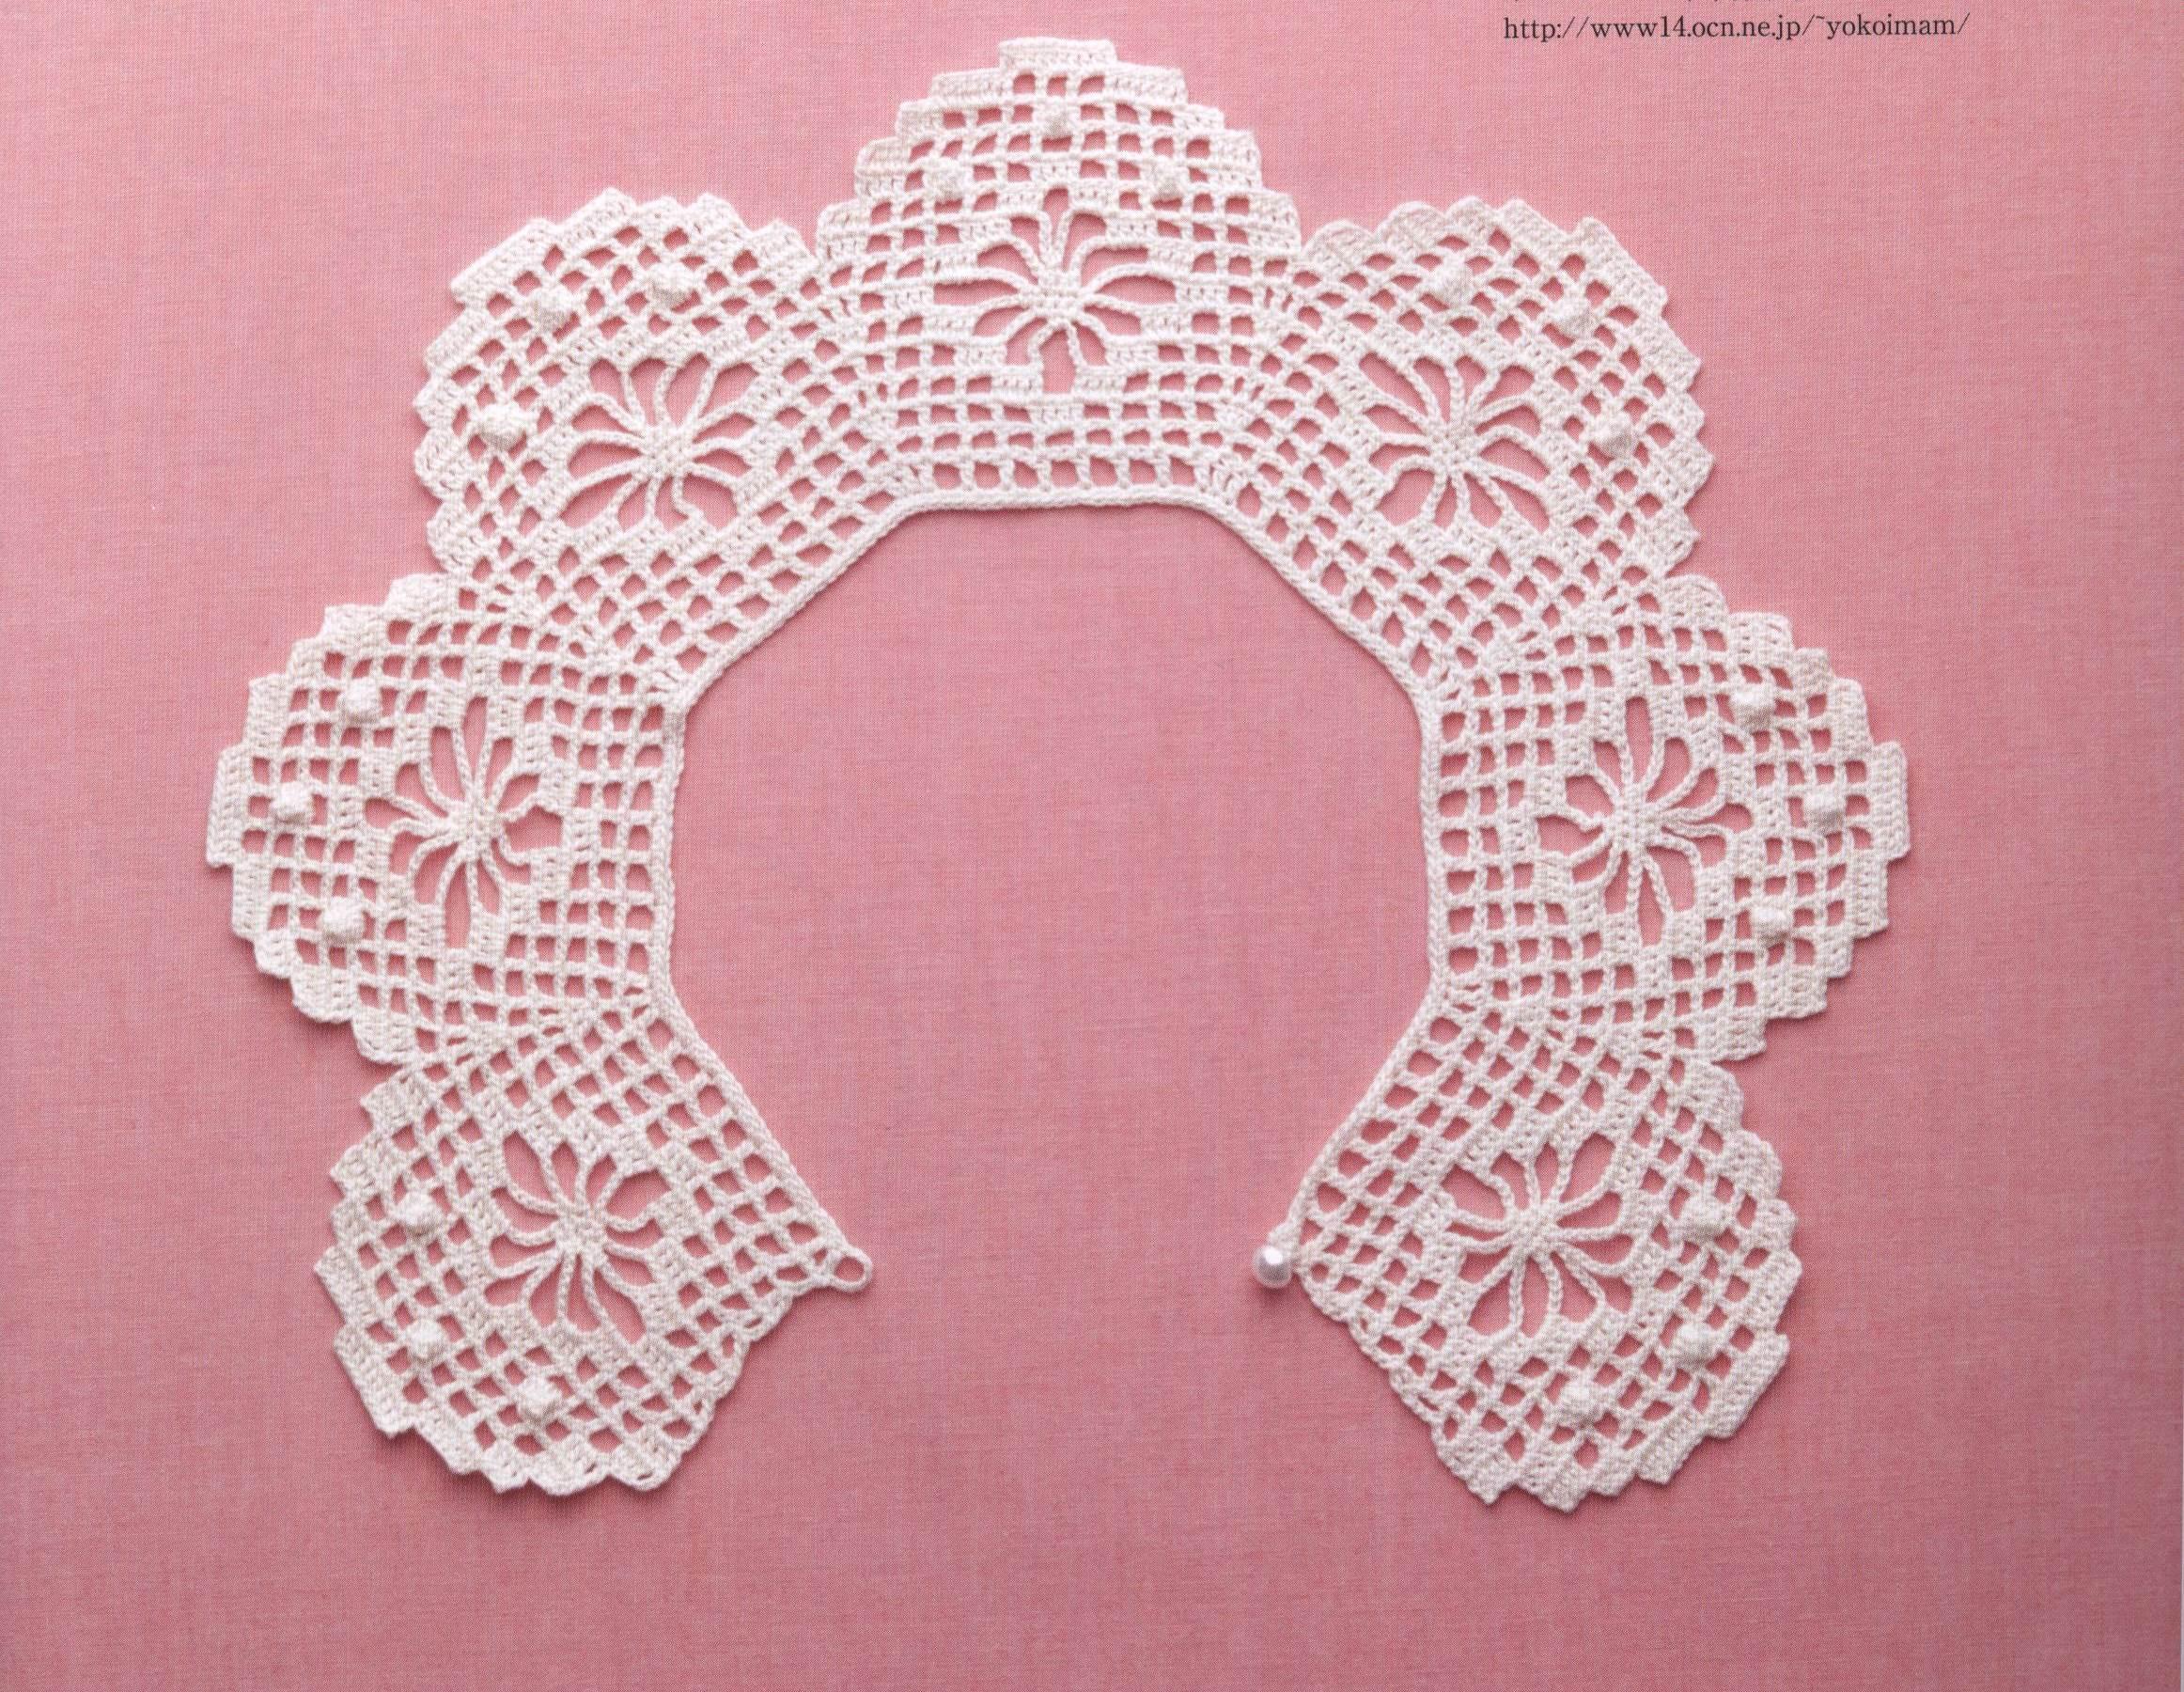 0007_Asahi Crochet Lace (55)